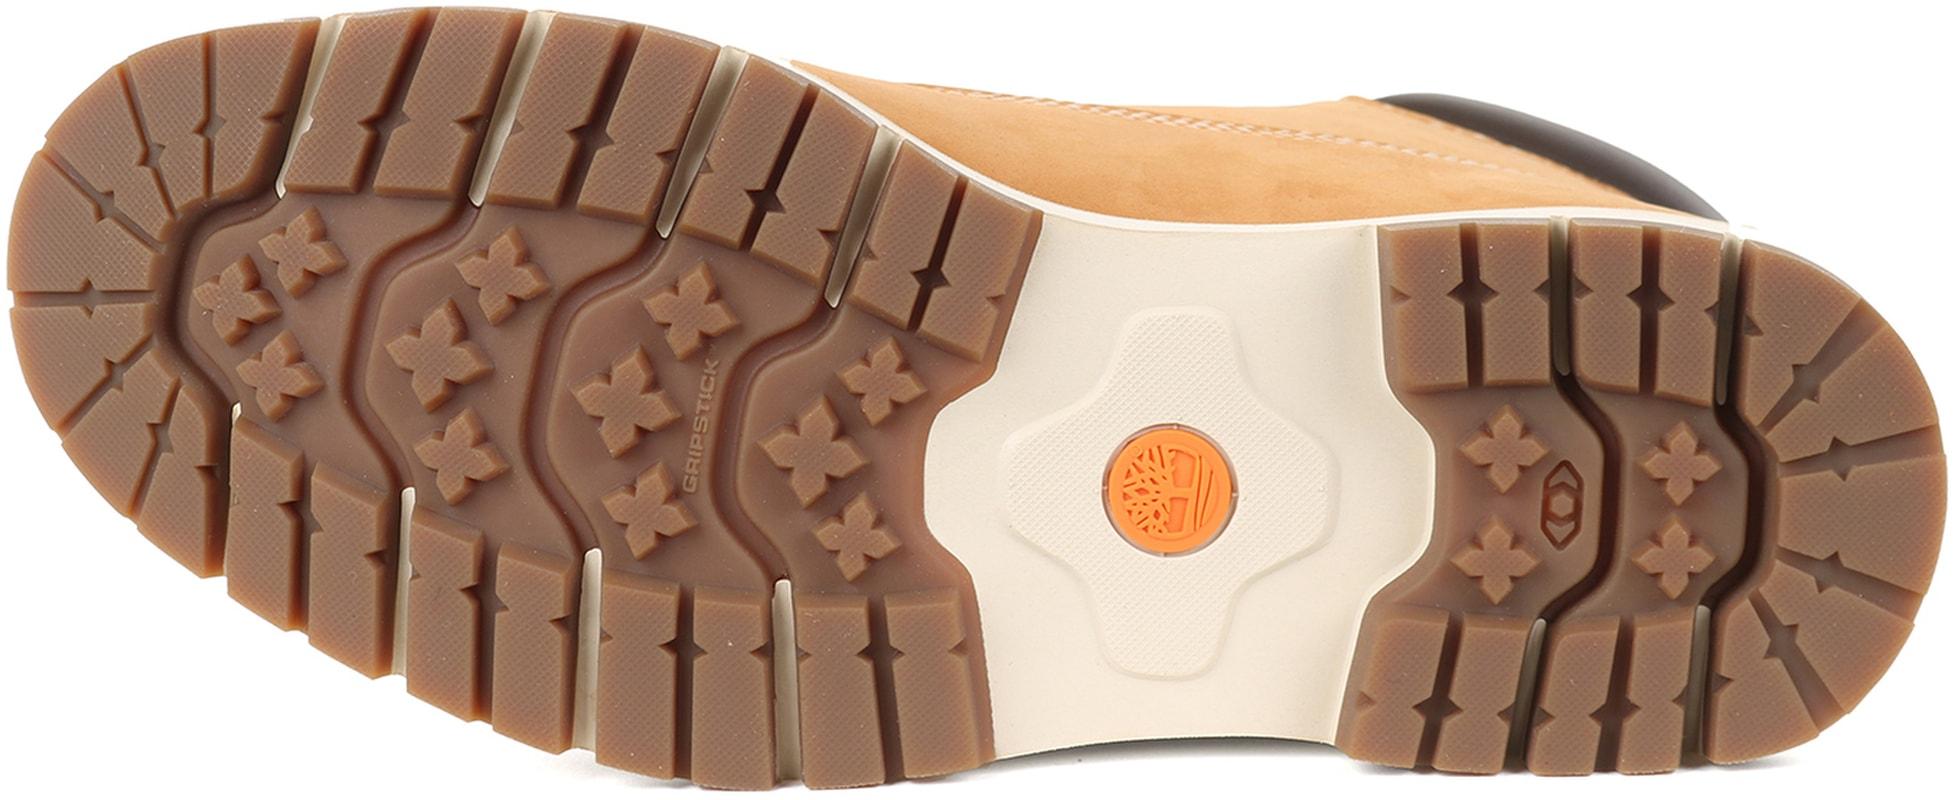 Detail Timberland Radfort 6-Inch Boots